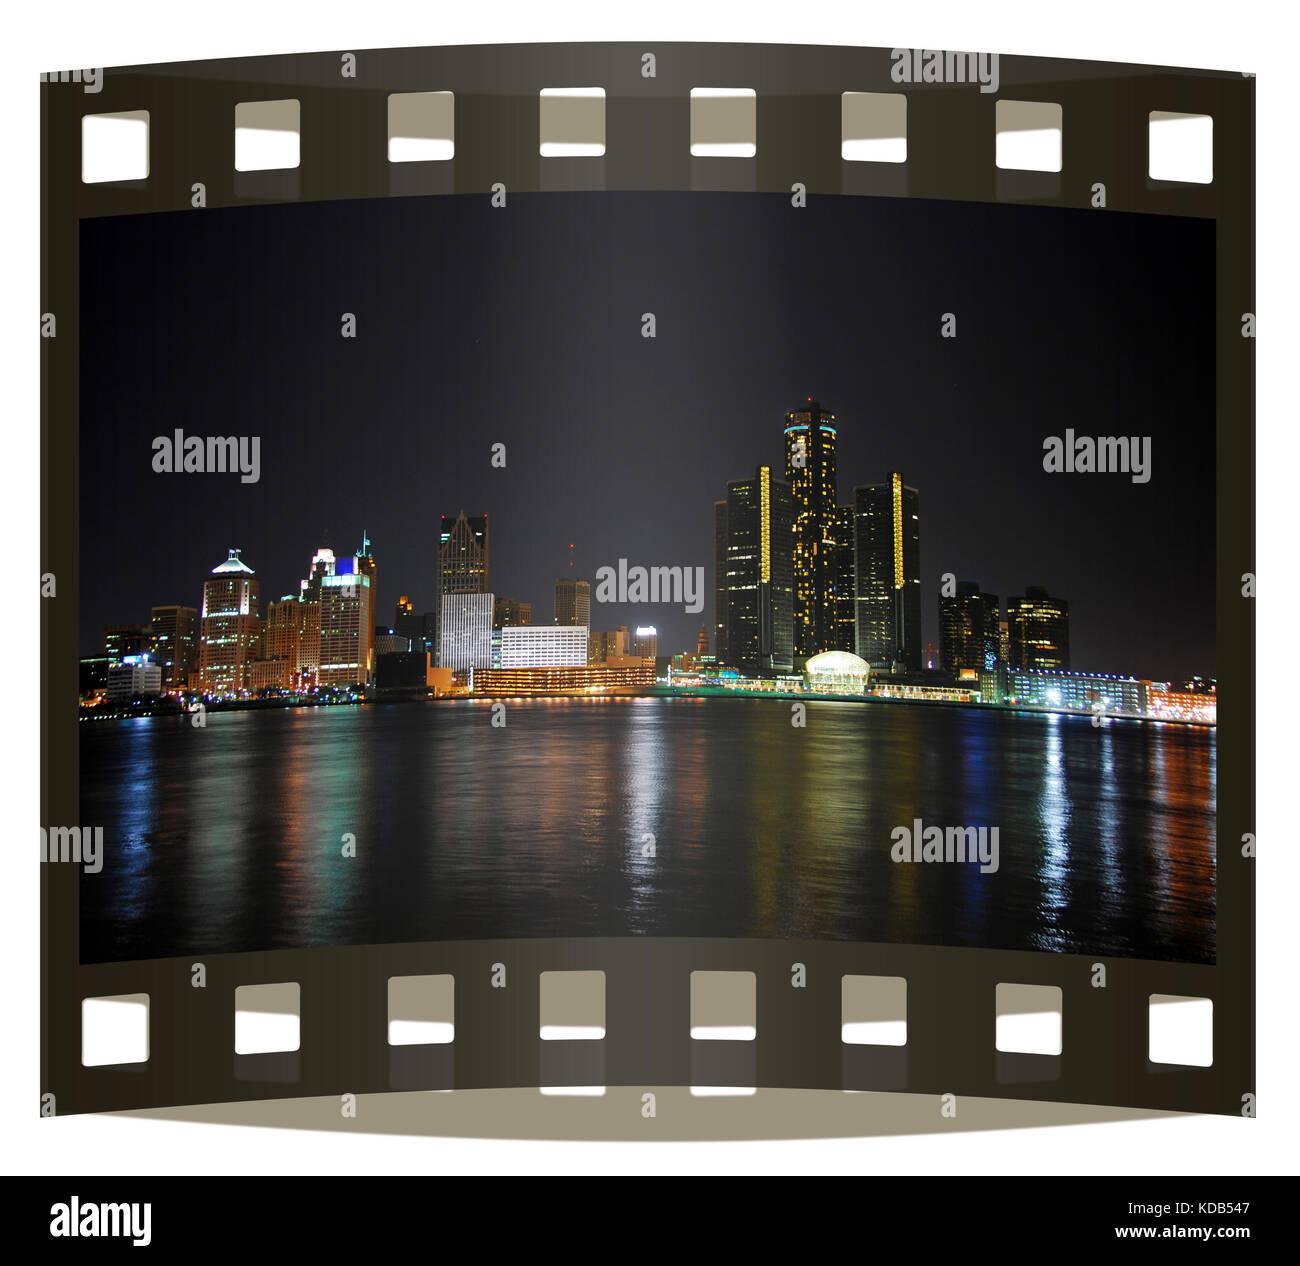 City skyline on photo slide - Stock Image